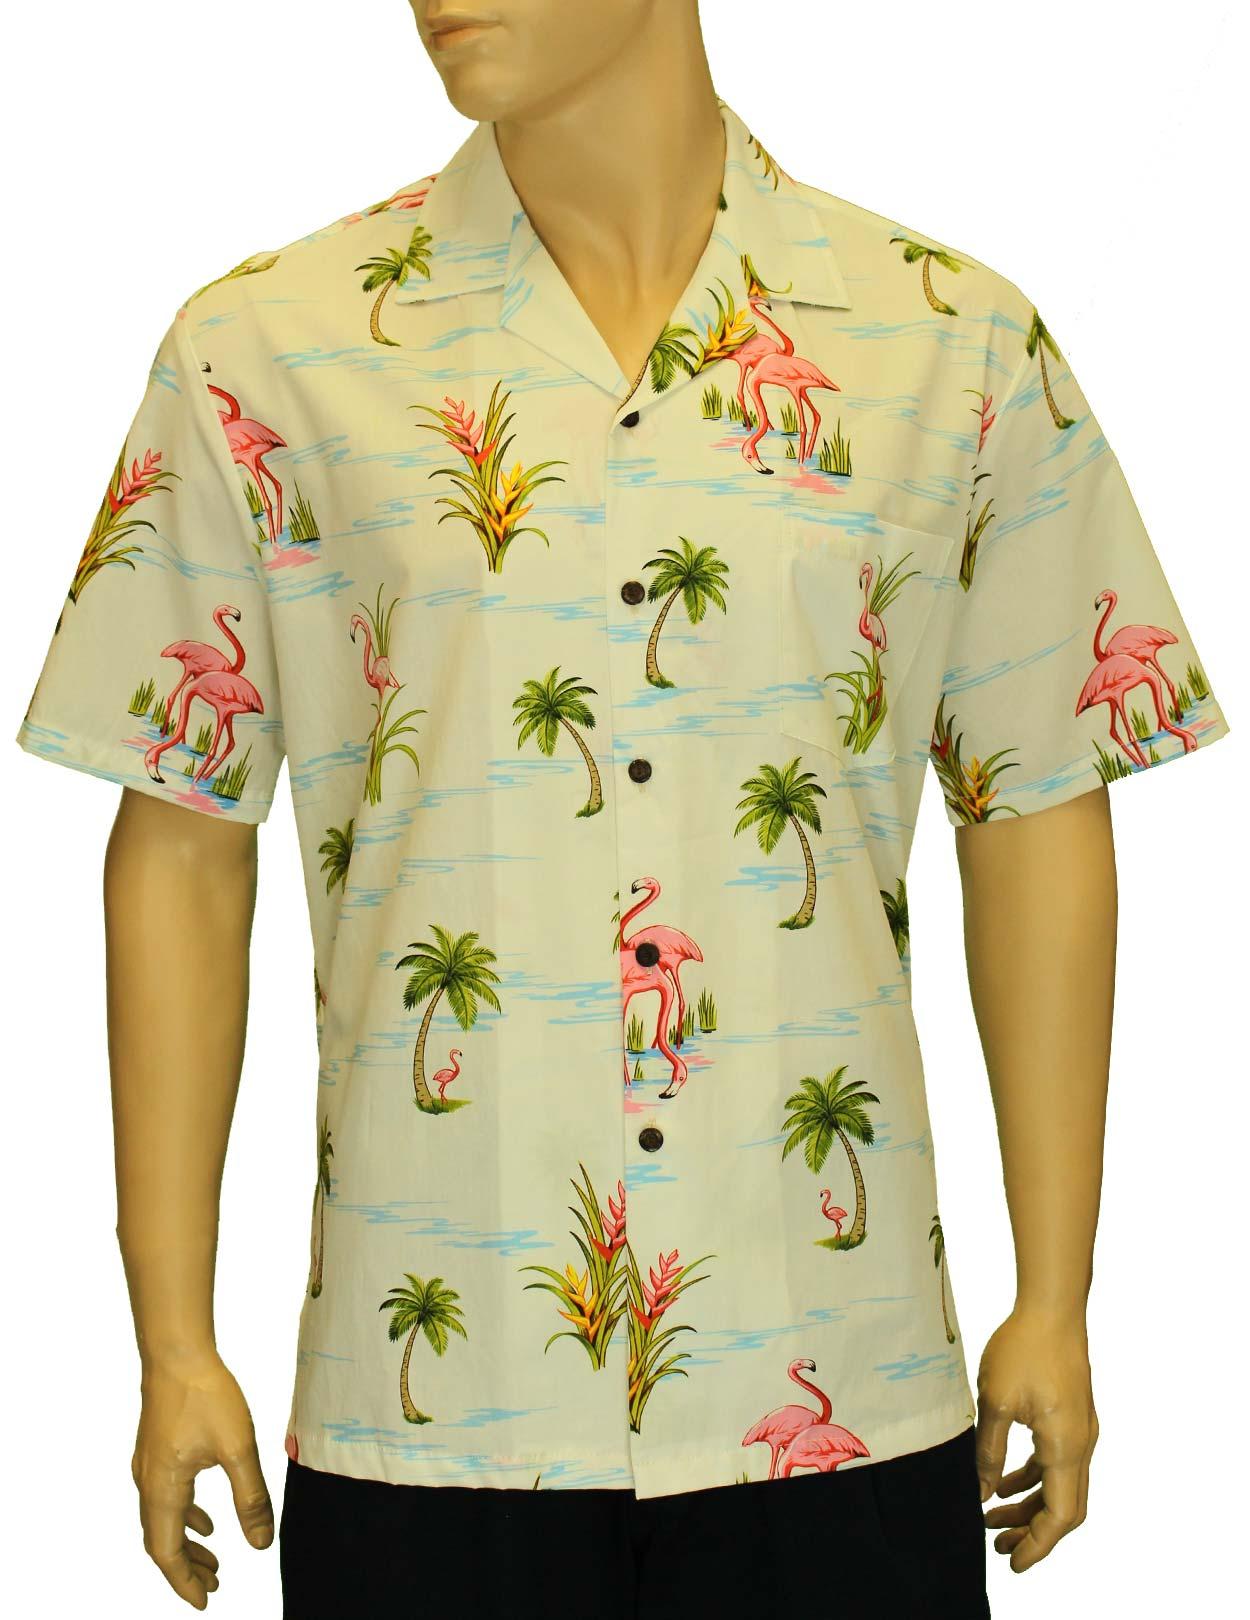 5a06af0bc57794 Florida Flamingos Tropics Hawaiian Shirt: Shaka Time Hawaii Clothing Store